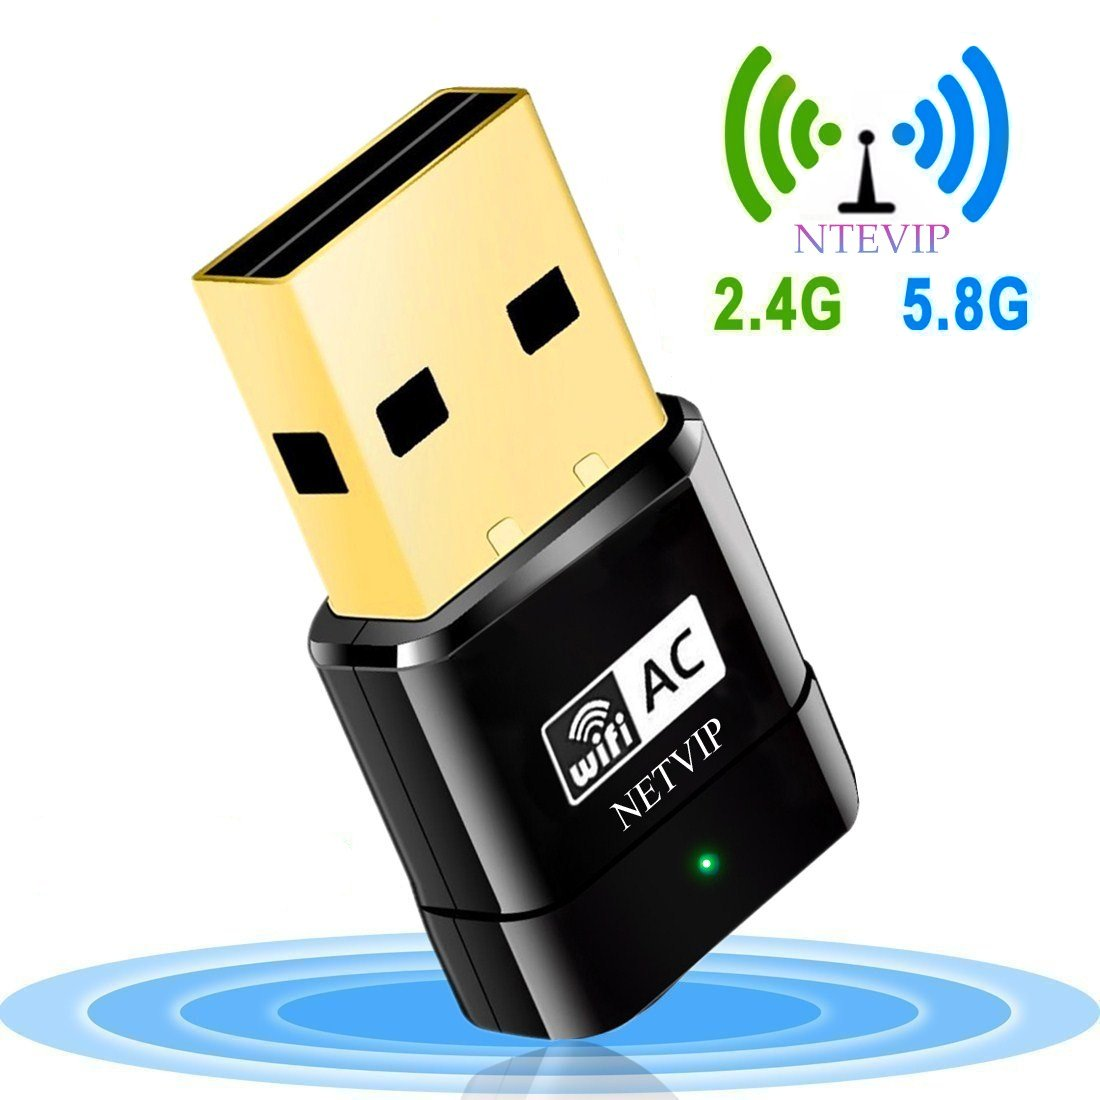 NETVIP Clé WiFi, AC600 WiFi USB Adaptateur, Hotspot Wireless Network Dual Band 5GHz/2.4GHz Mini AP WiFi Dongle Applique à Windows XP/Vista/7/8/10(32/64 Bits)/Linux/Mac OS X